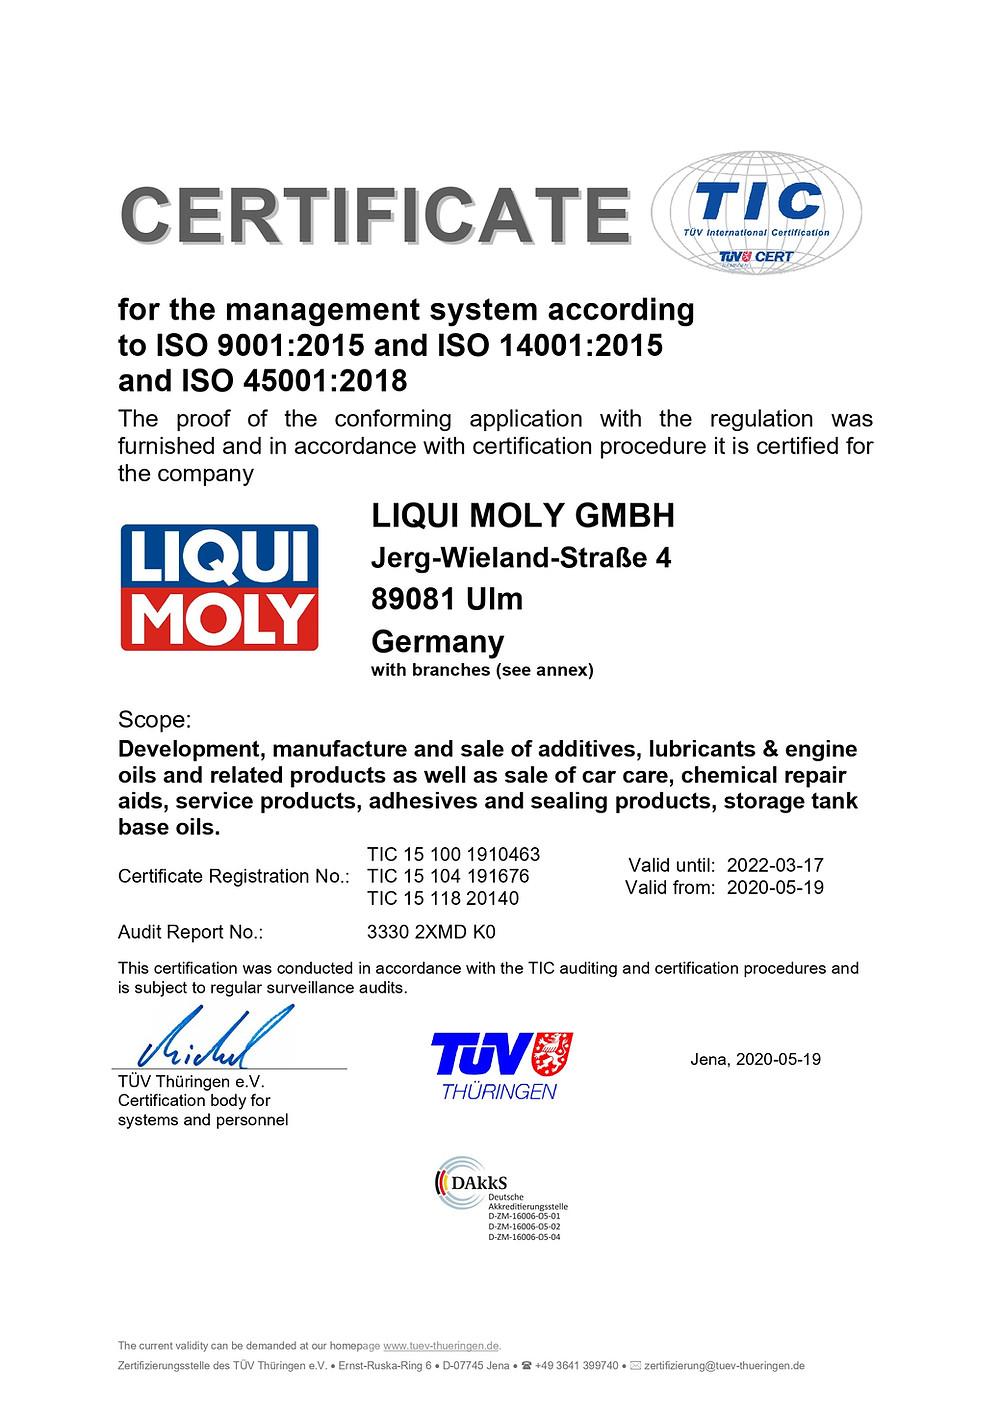 LIQUI MOLY ISO 9001:2008認證